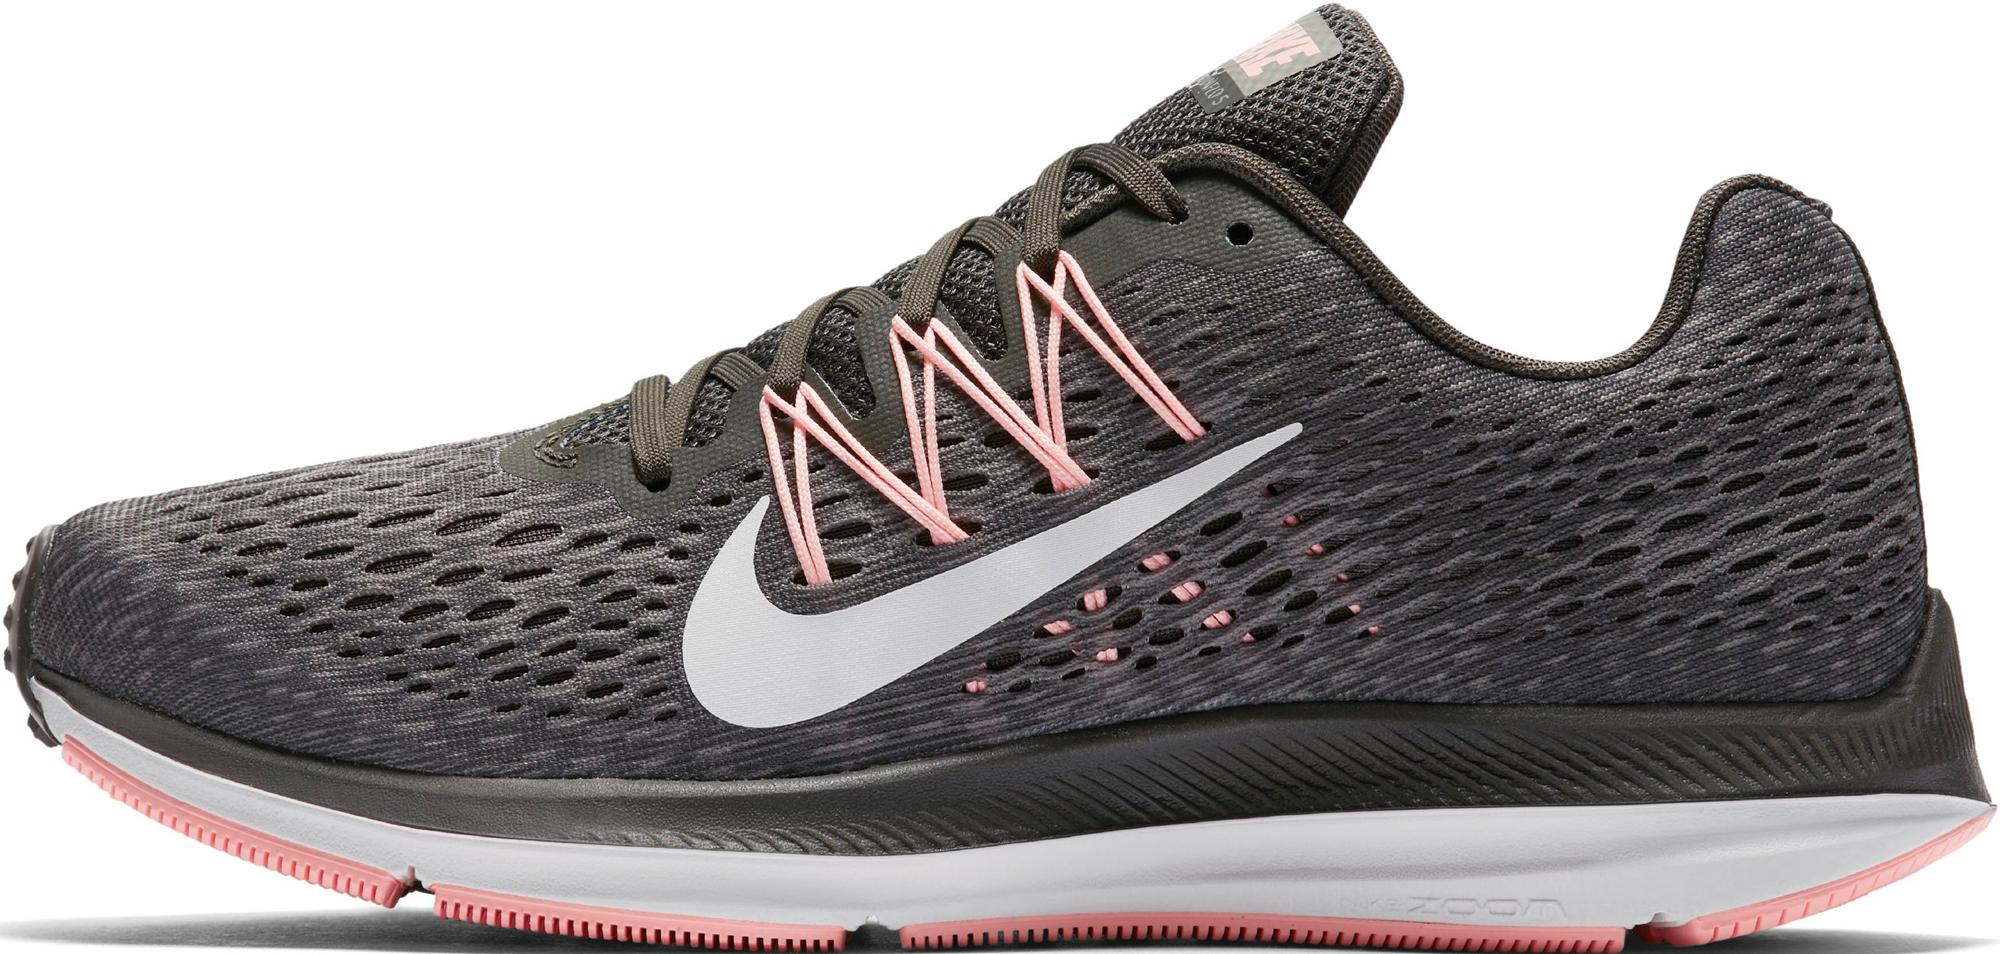 Nike Кроссовки женские Nike Winflo 5, размер 40